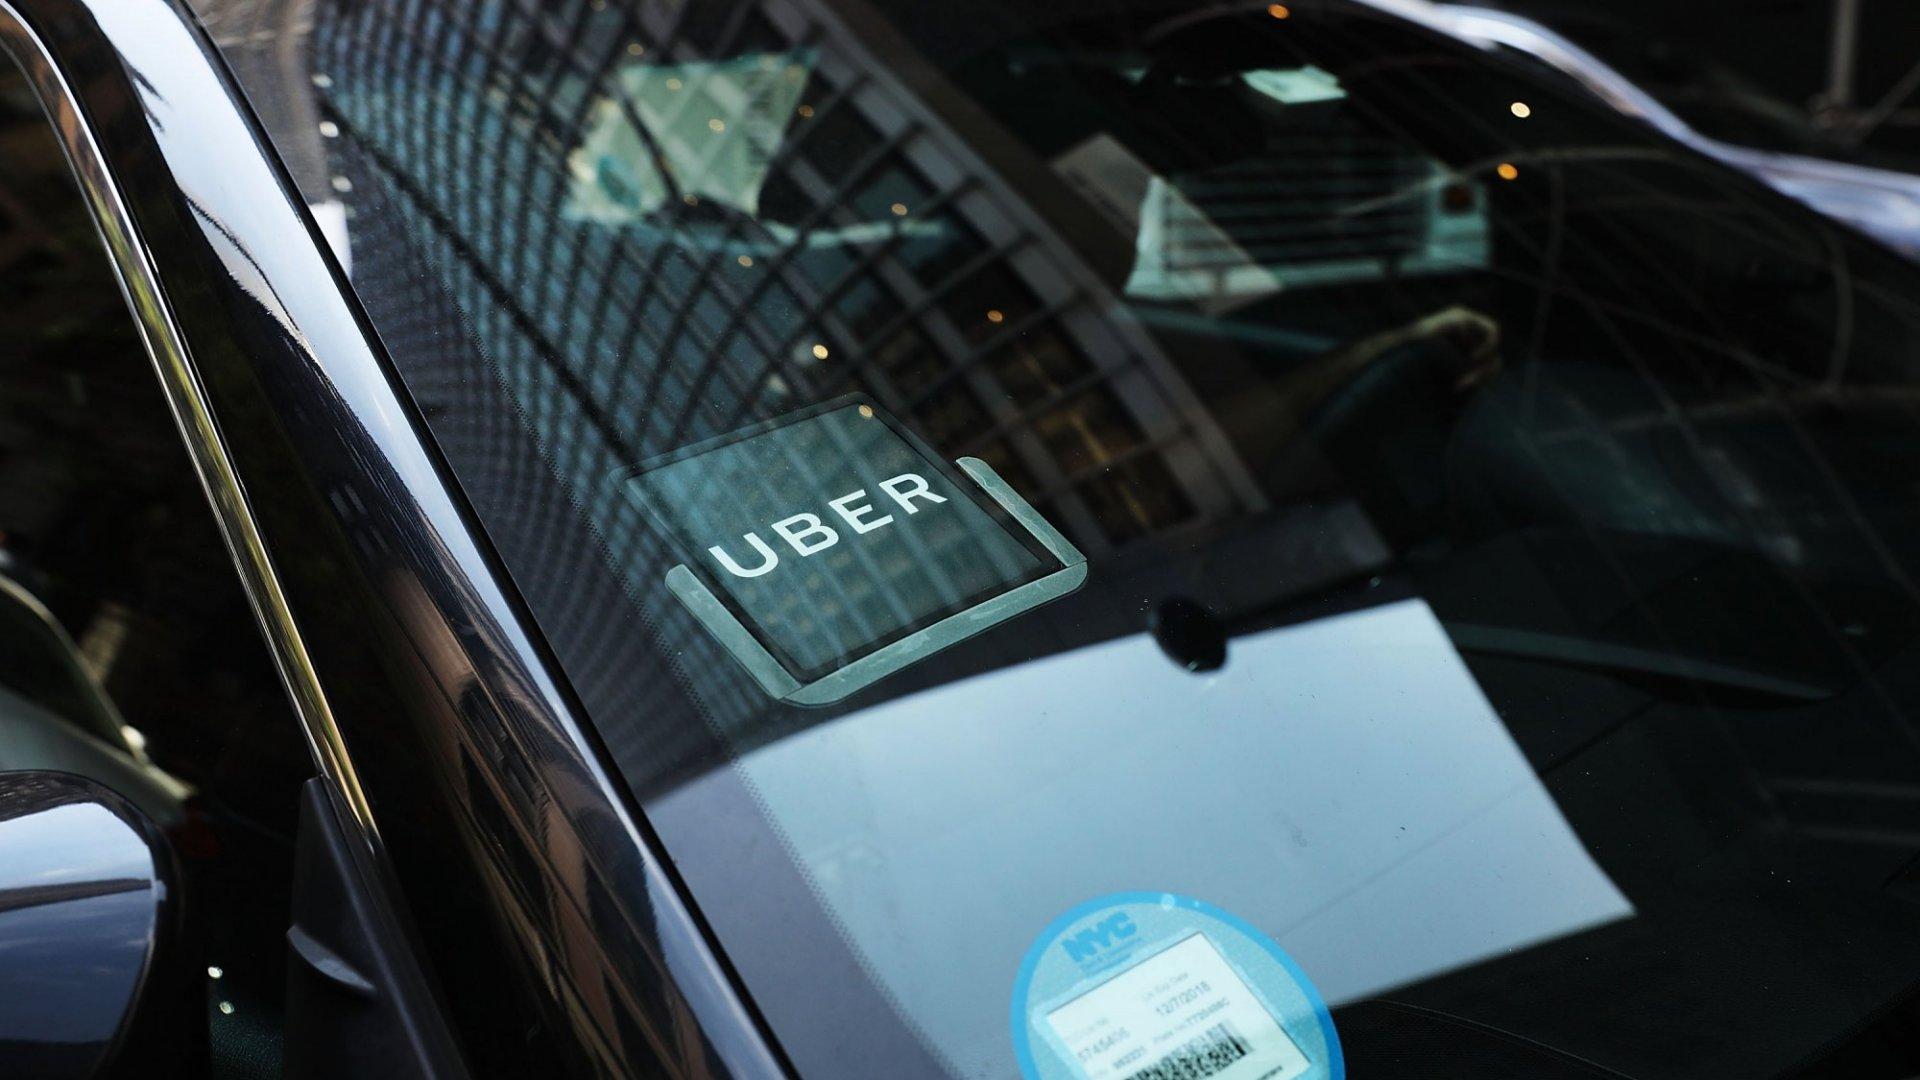 Uber's Plan for Keeping Cars Coronavirus-Free